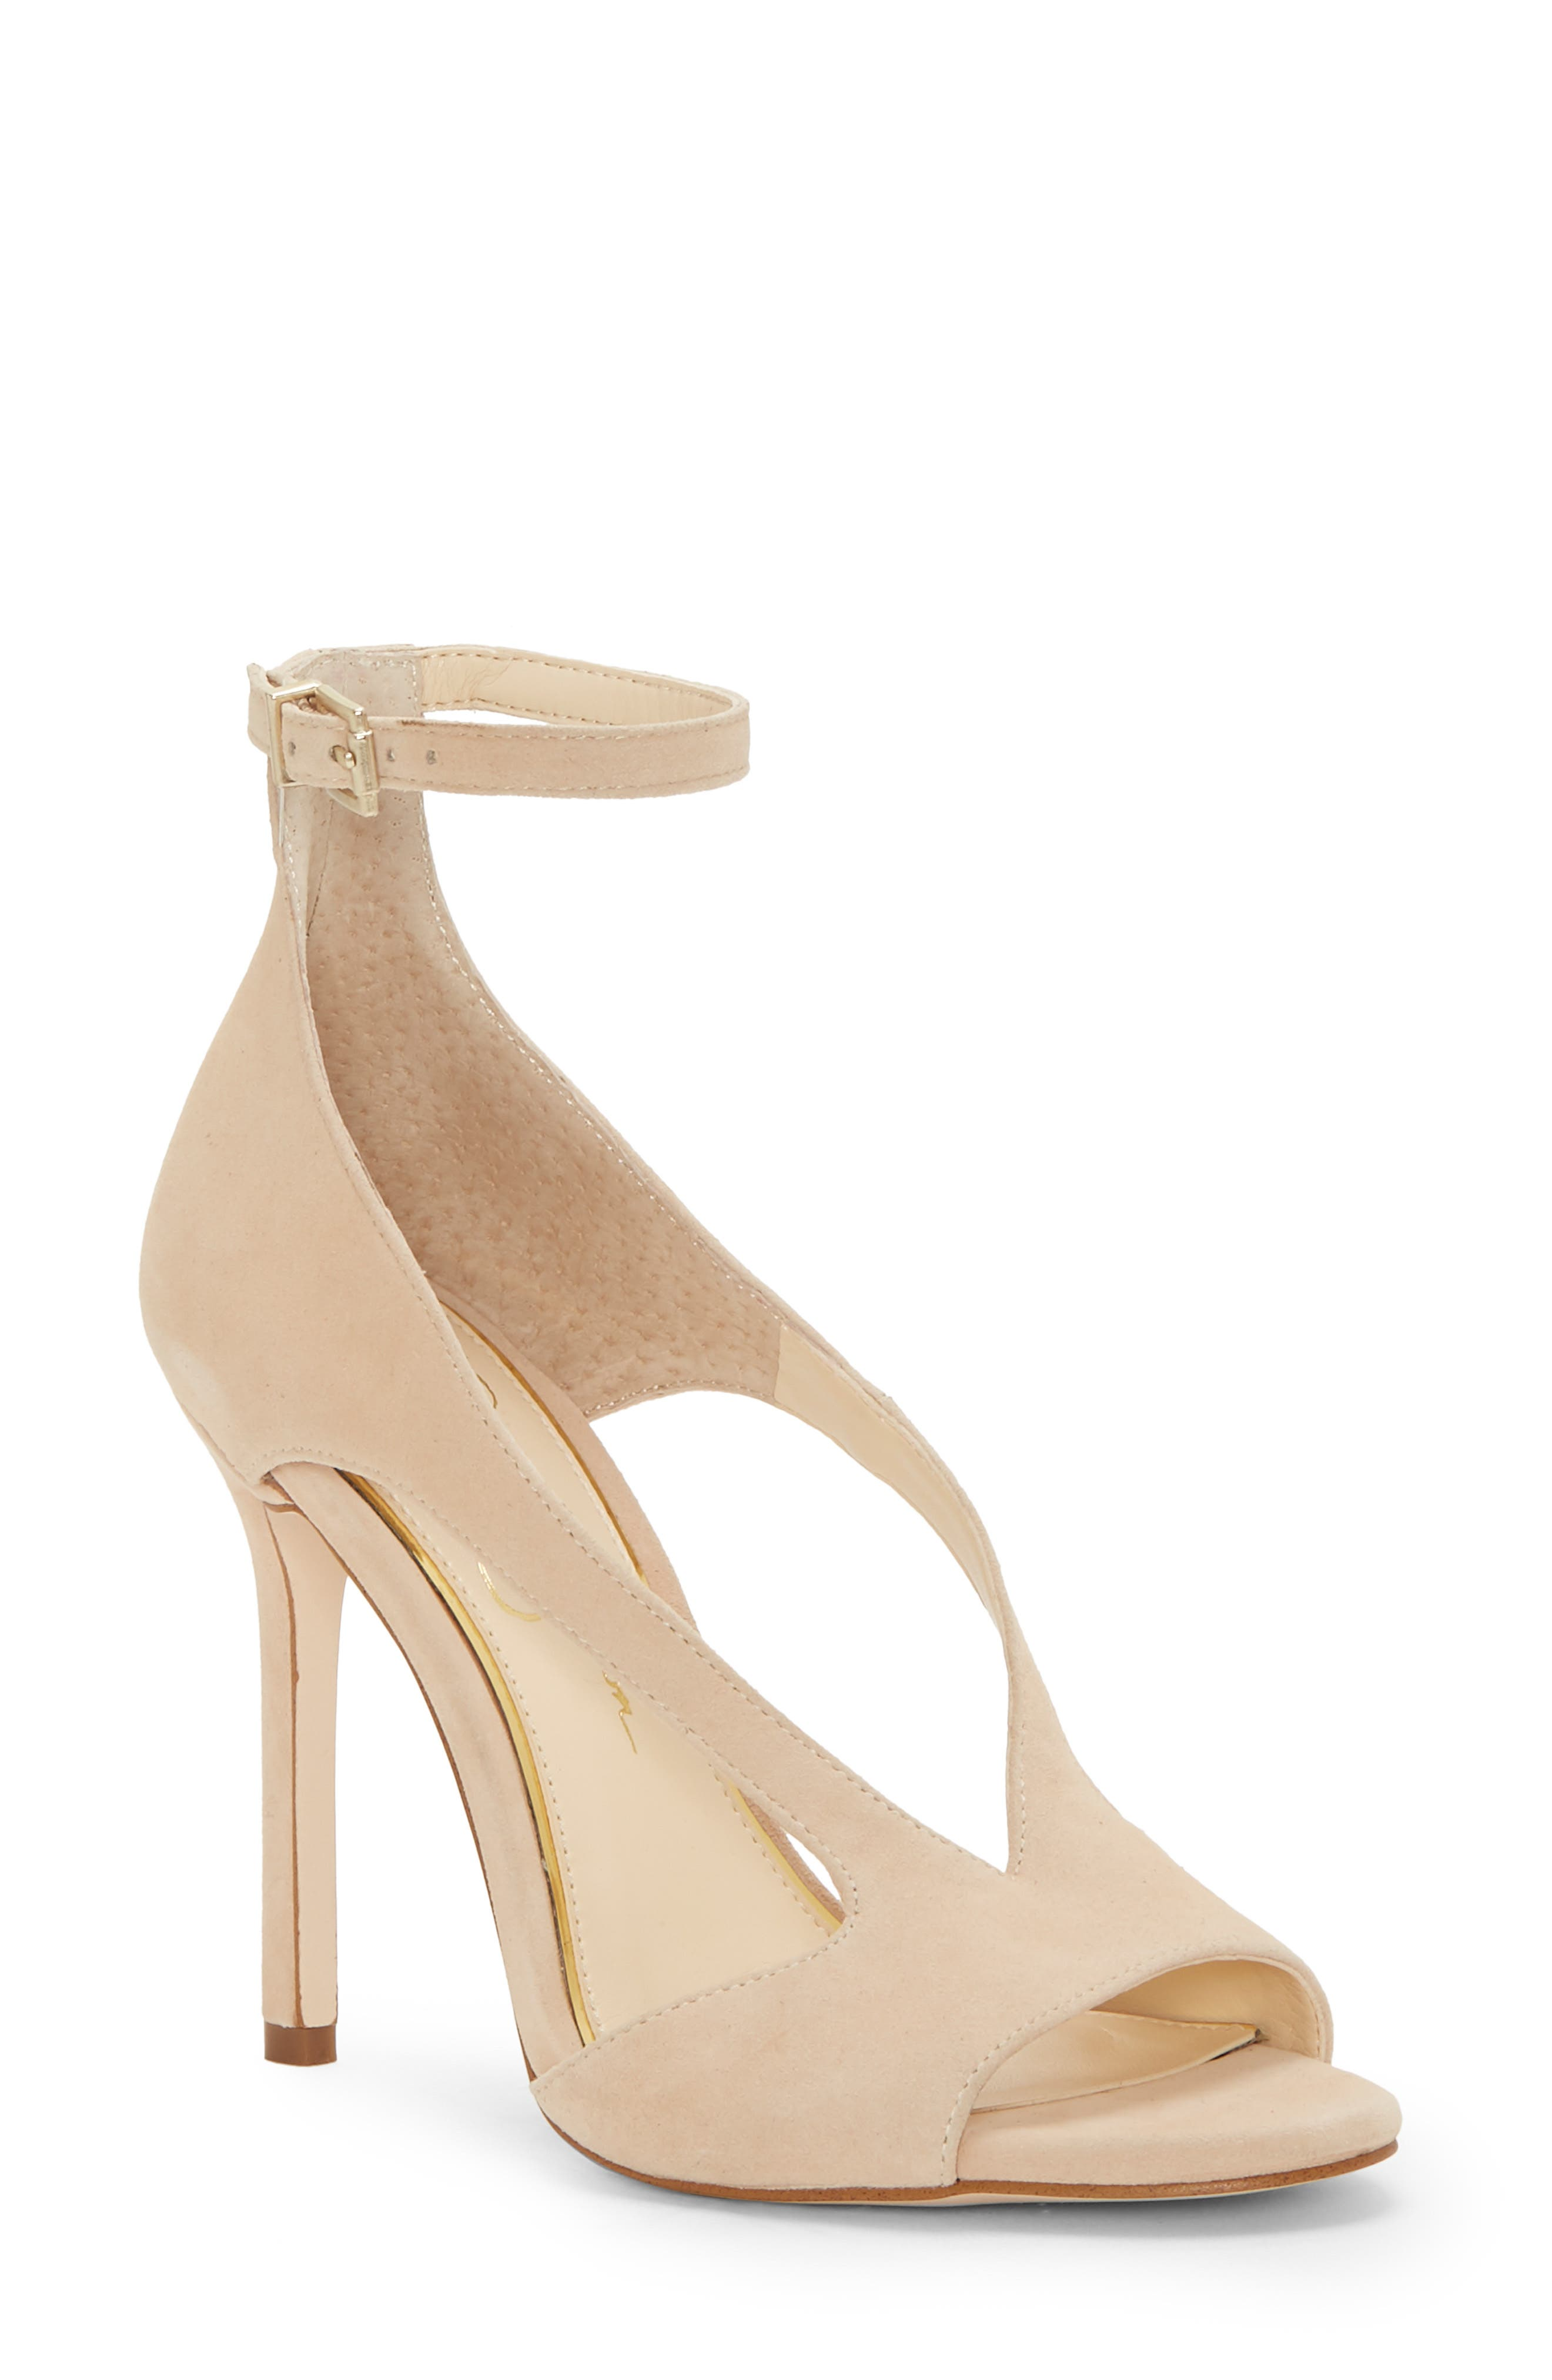 Jessica Simpson Jasta Ankle Strap Sandal, Beige